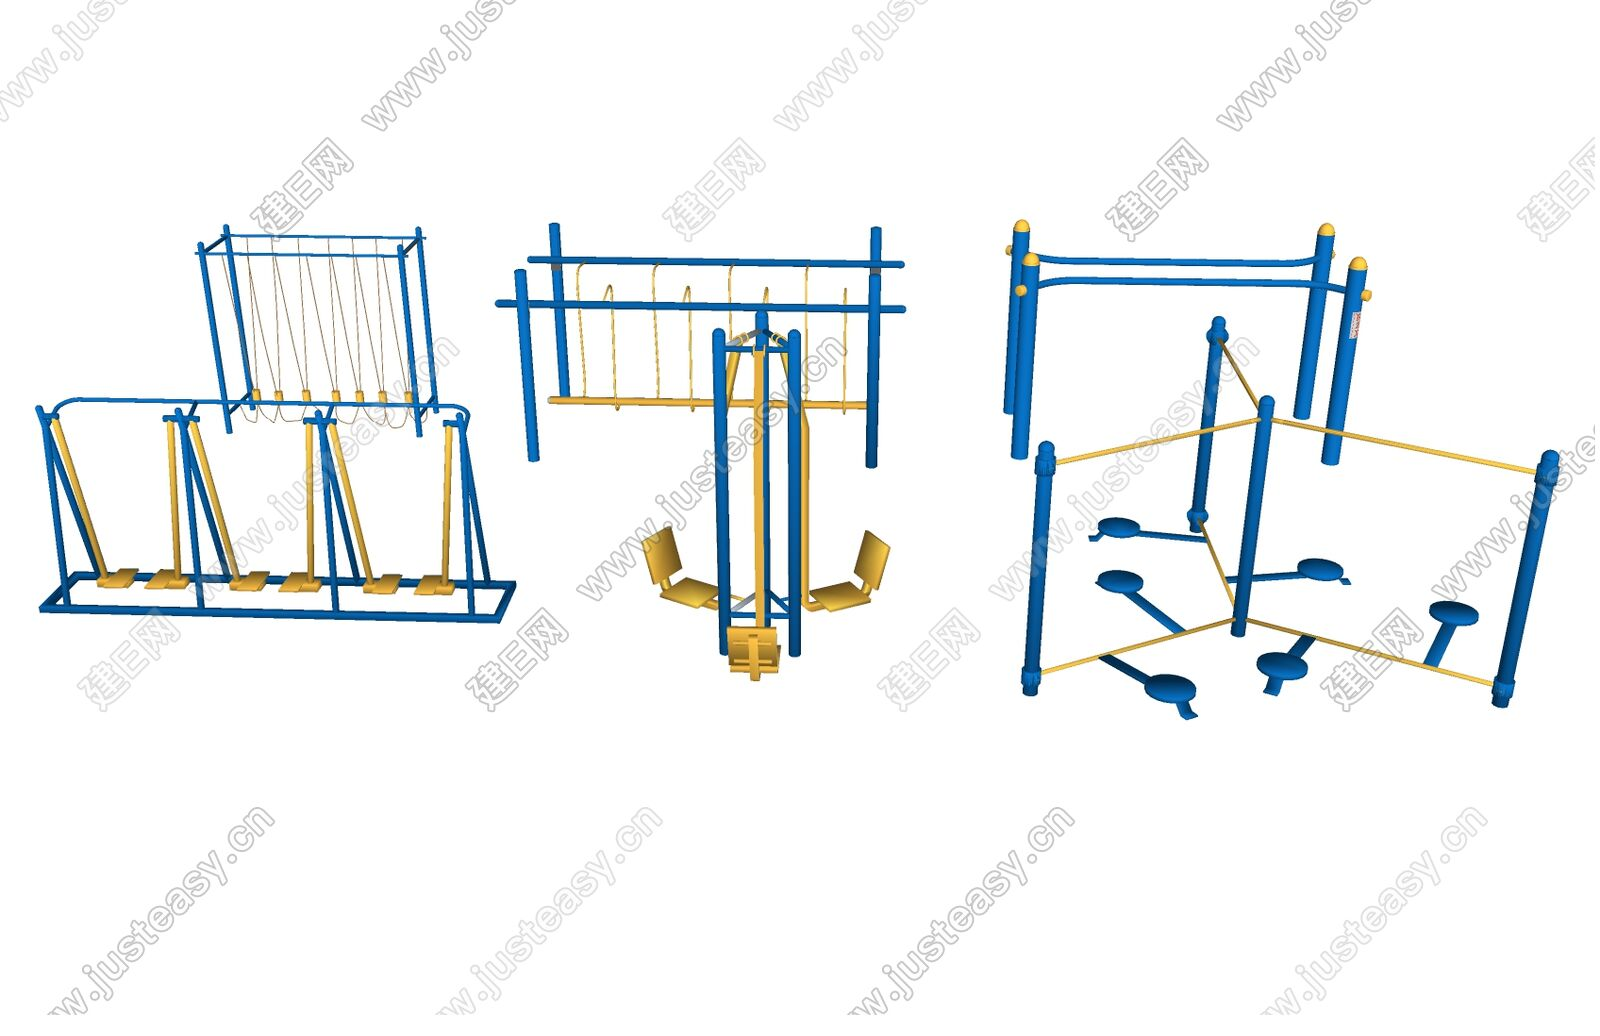 现代户外健身器材sketchup模型